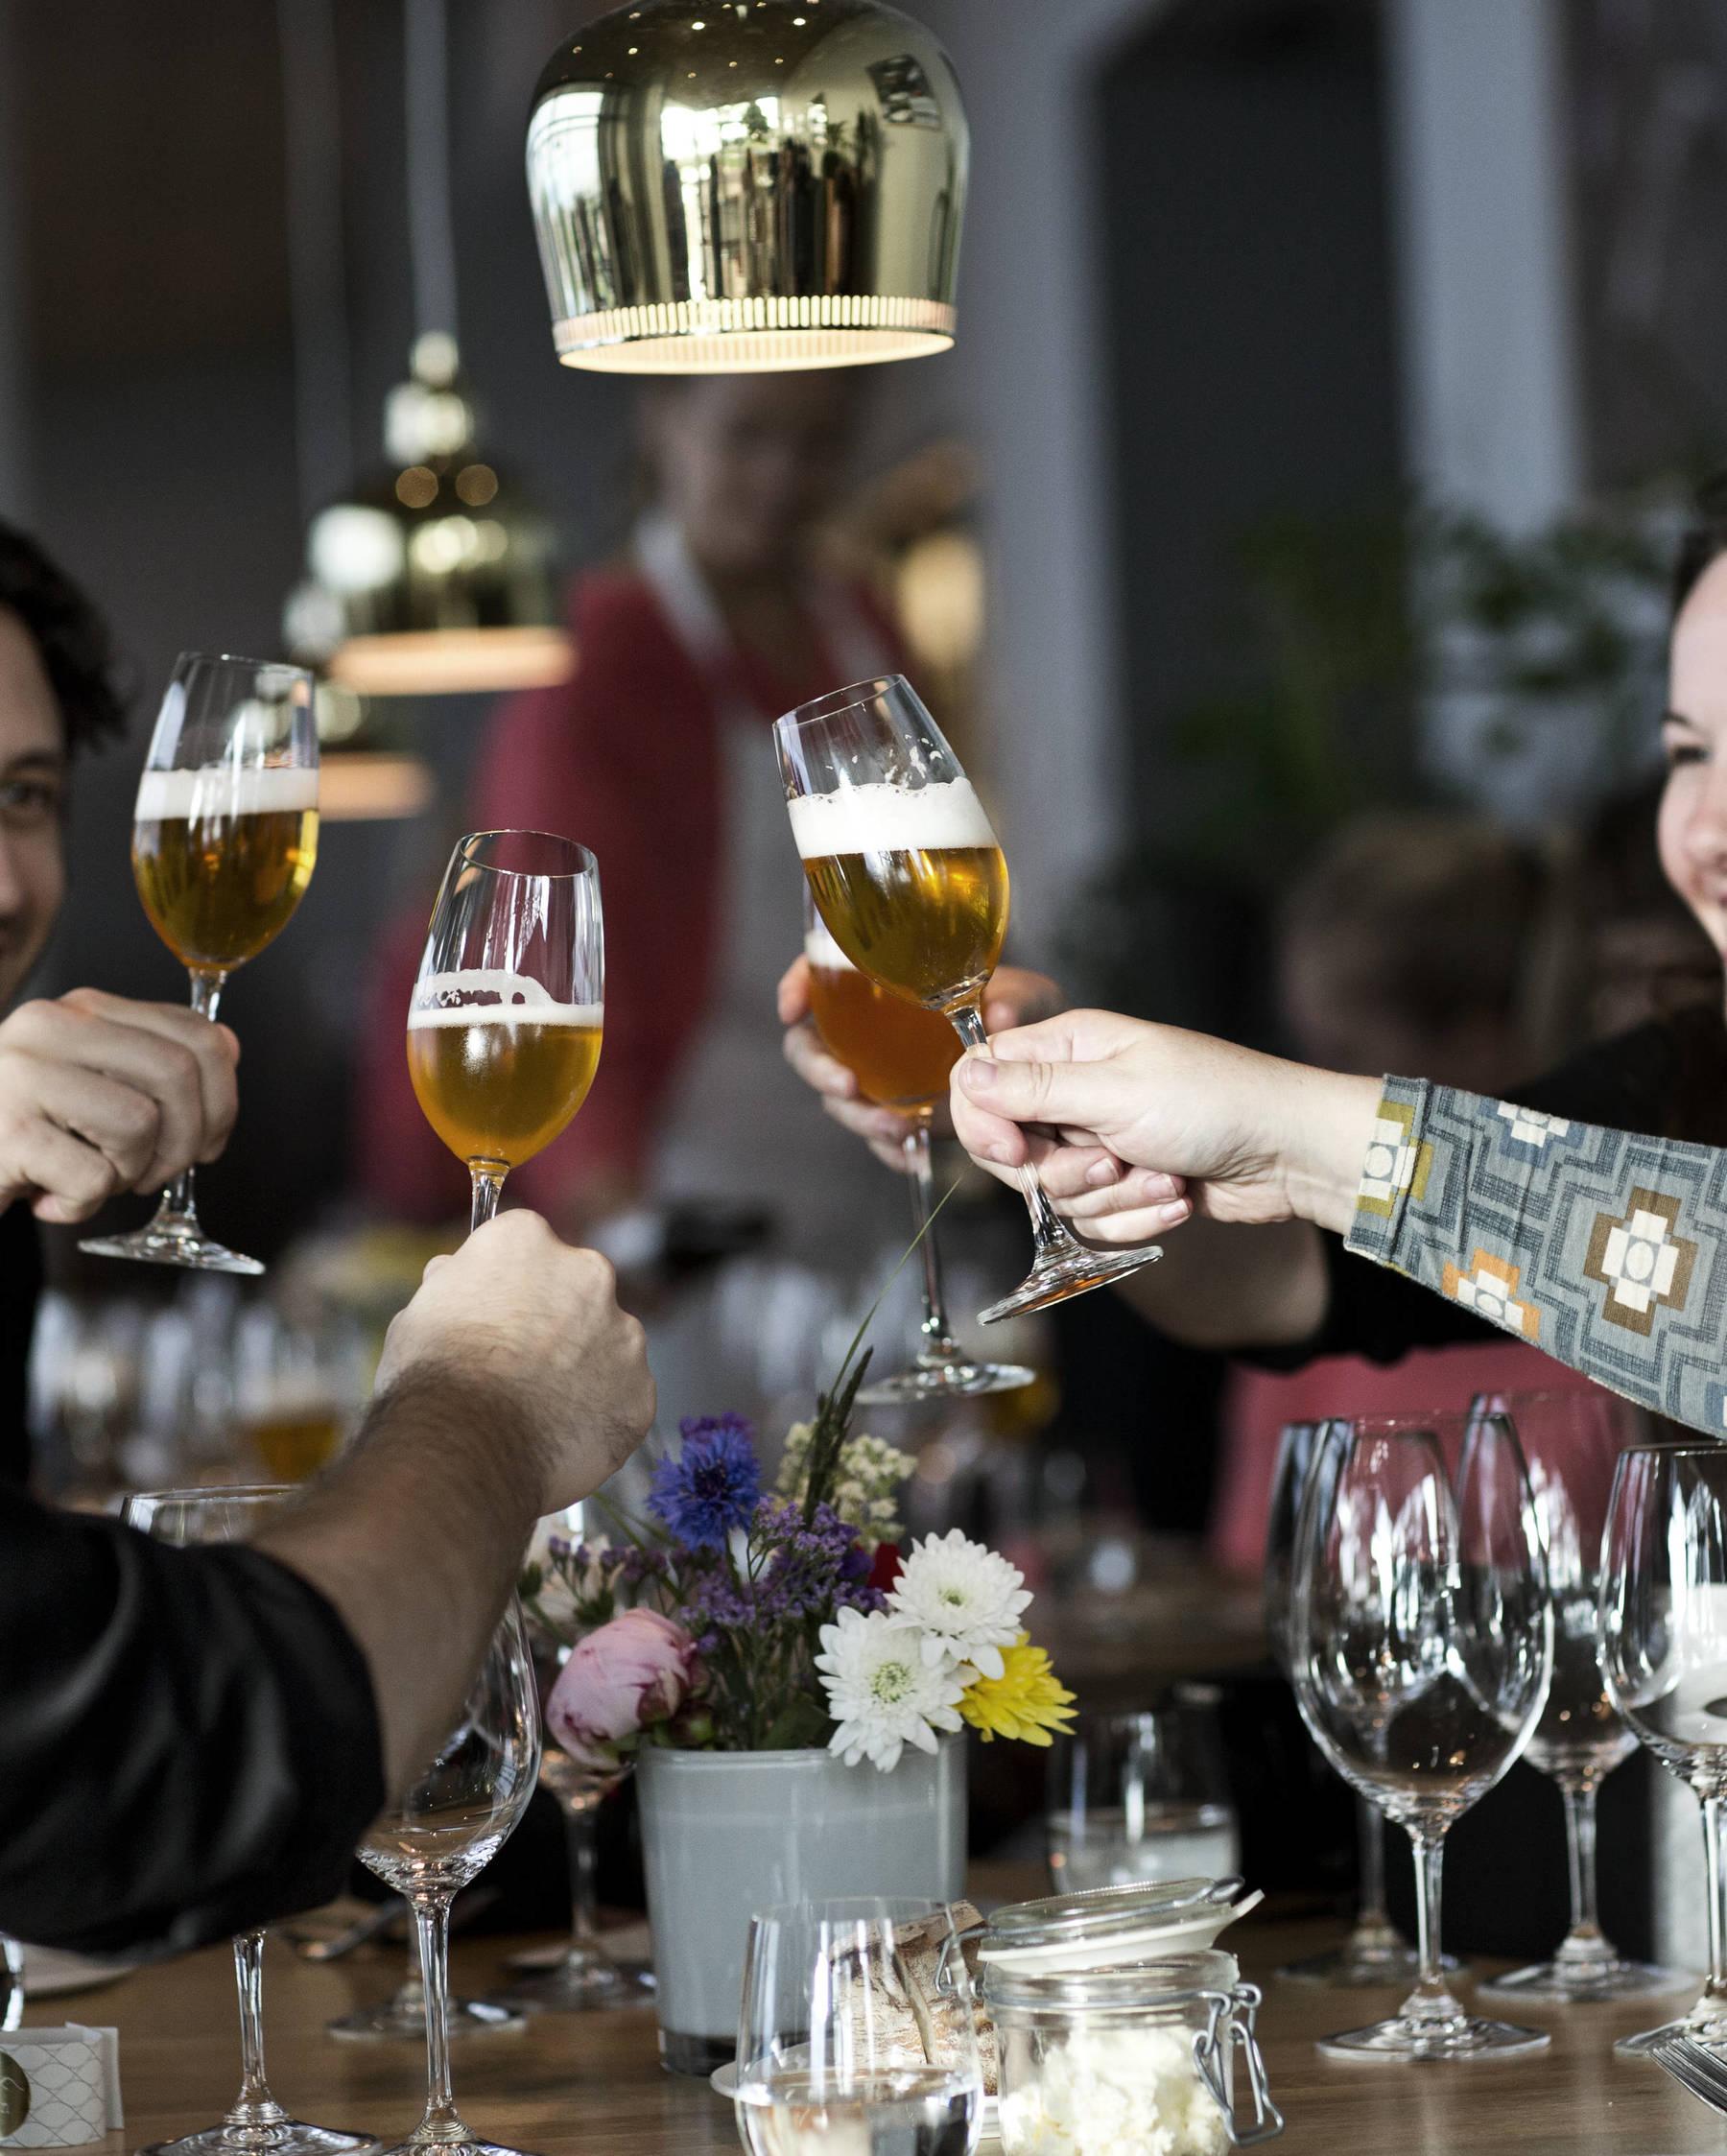 A friendly cheers at award-winning restaurant Sjön in Jönköping